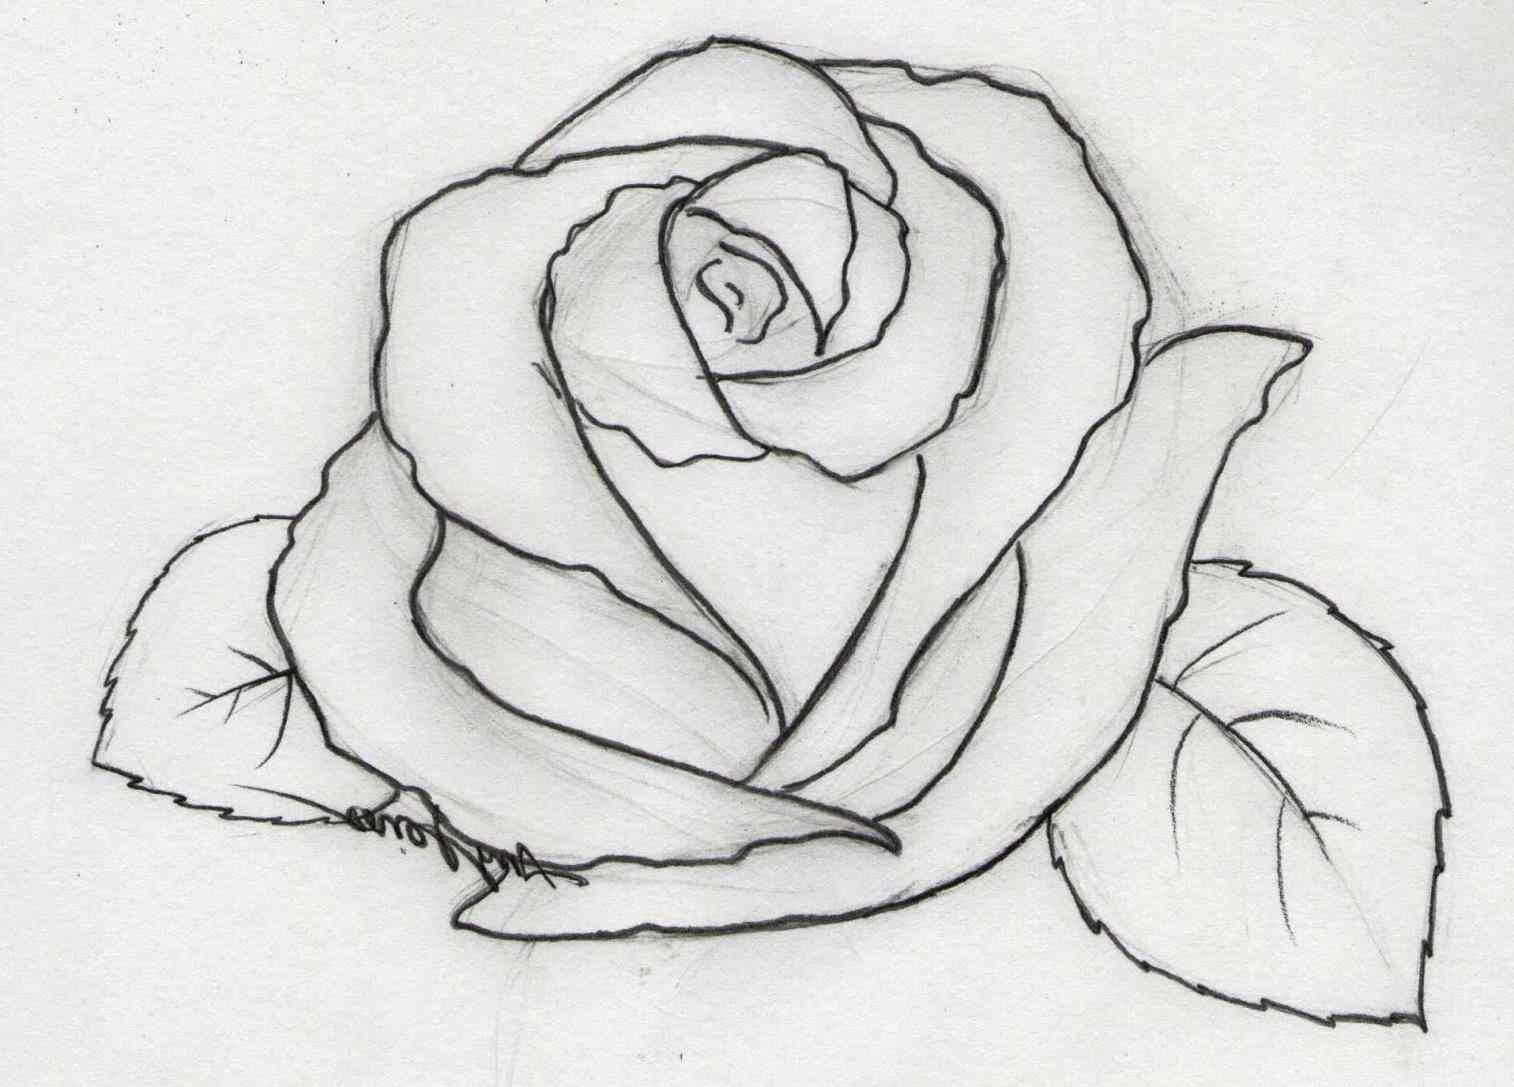 Pencil Drawing Rose Flowers Easy Flower Drawings In Jpg Rose Flower Sketch Images Flower Sketches Pencil Drawings Easy Flower Drawing